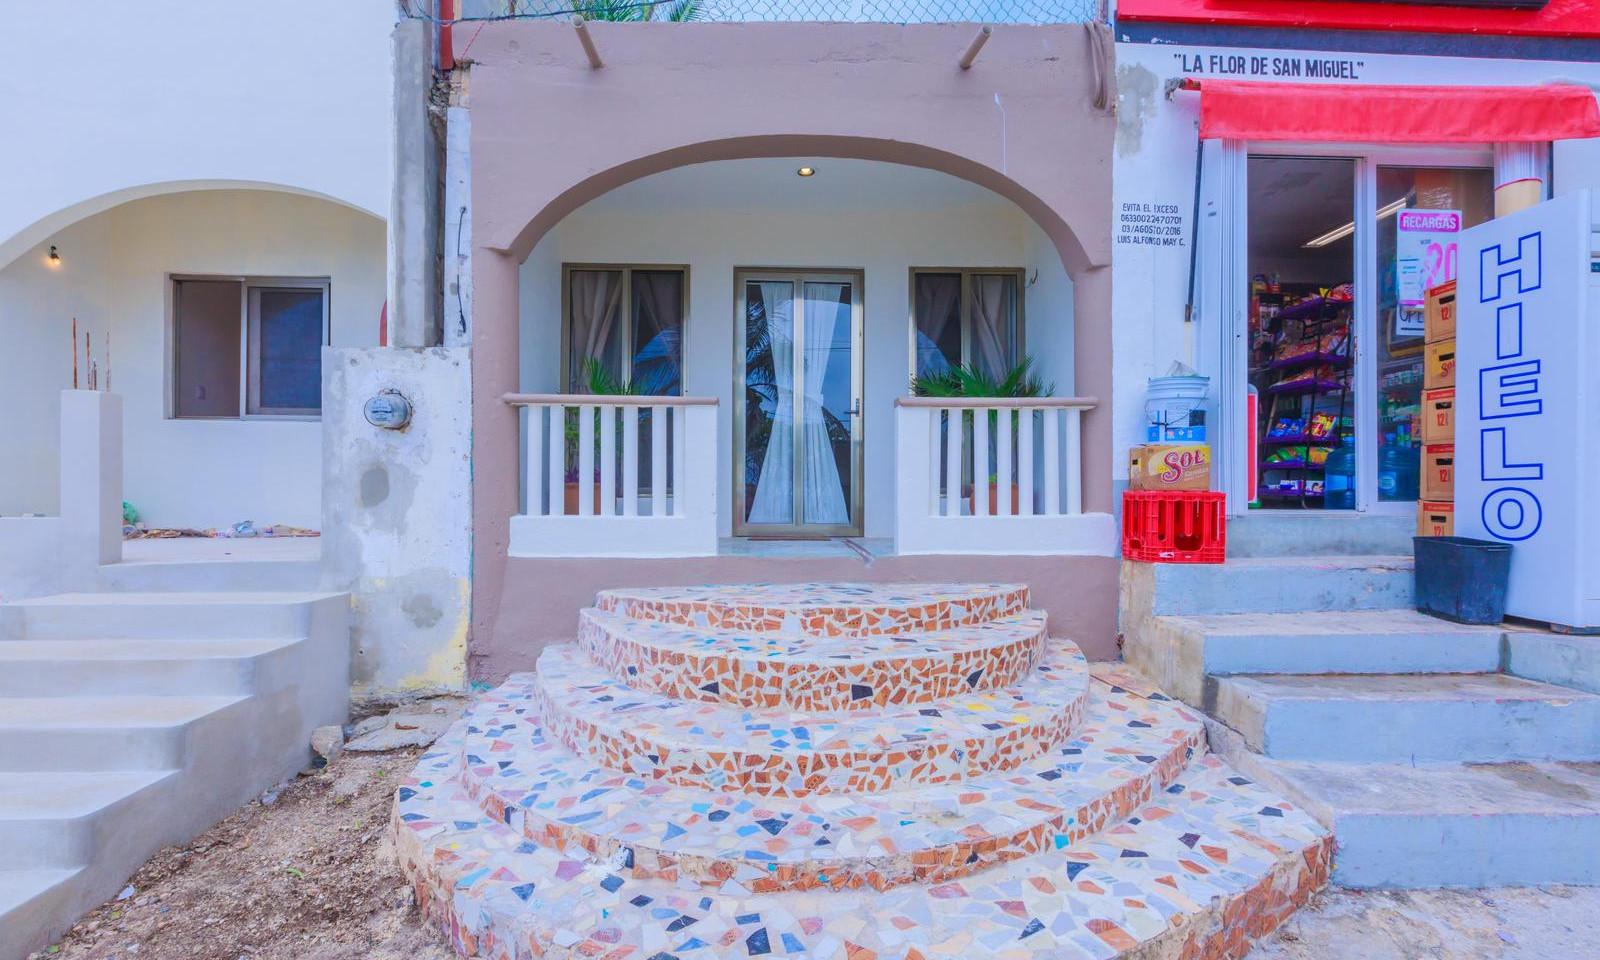 House of Mirrors | Isla Mujeres, Mexico | Taste of Isla